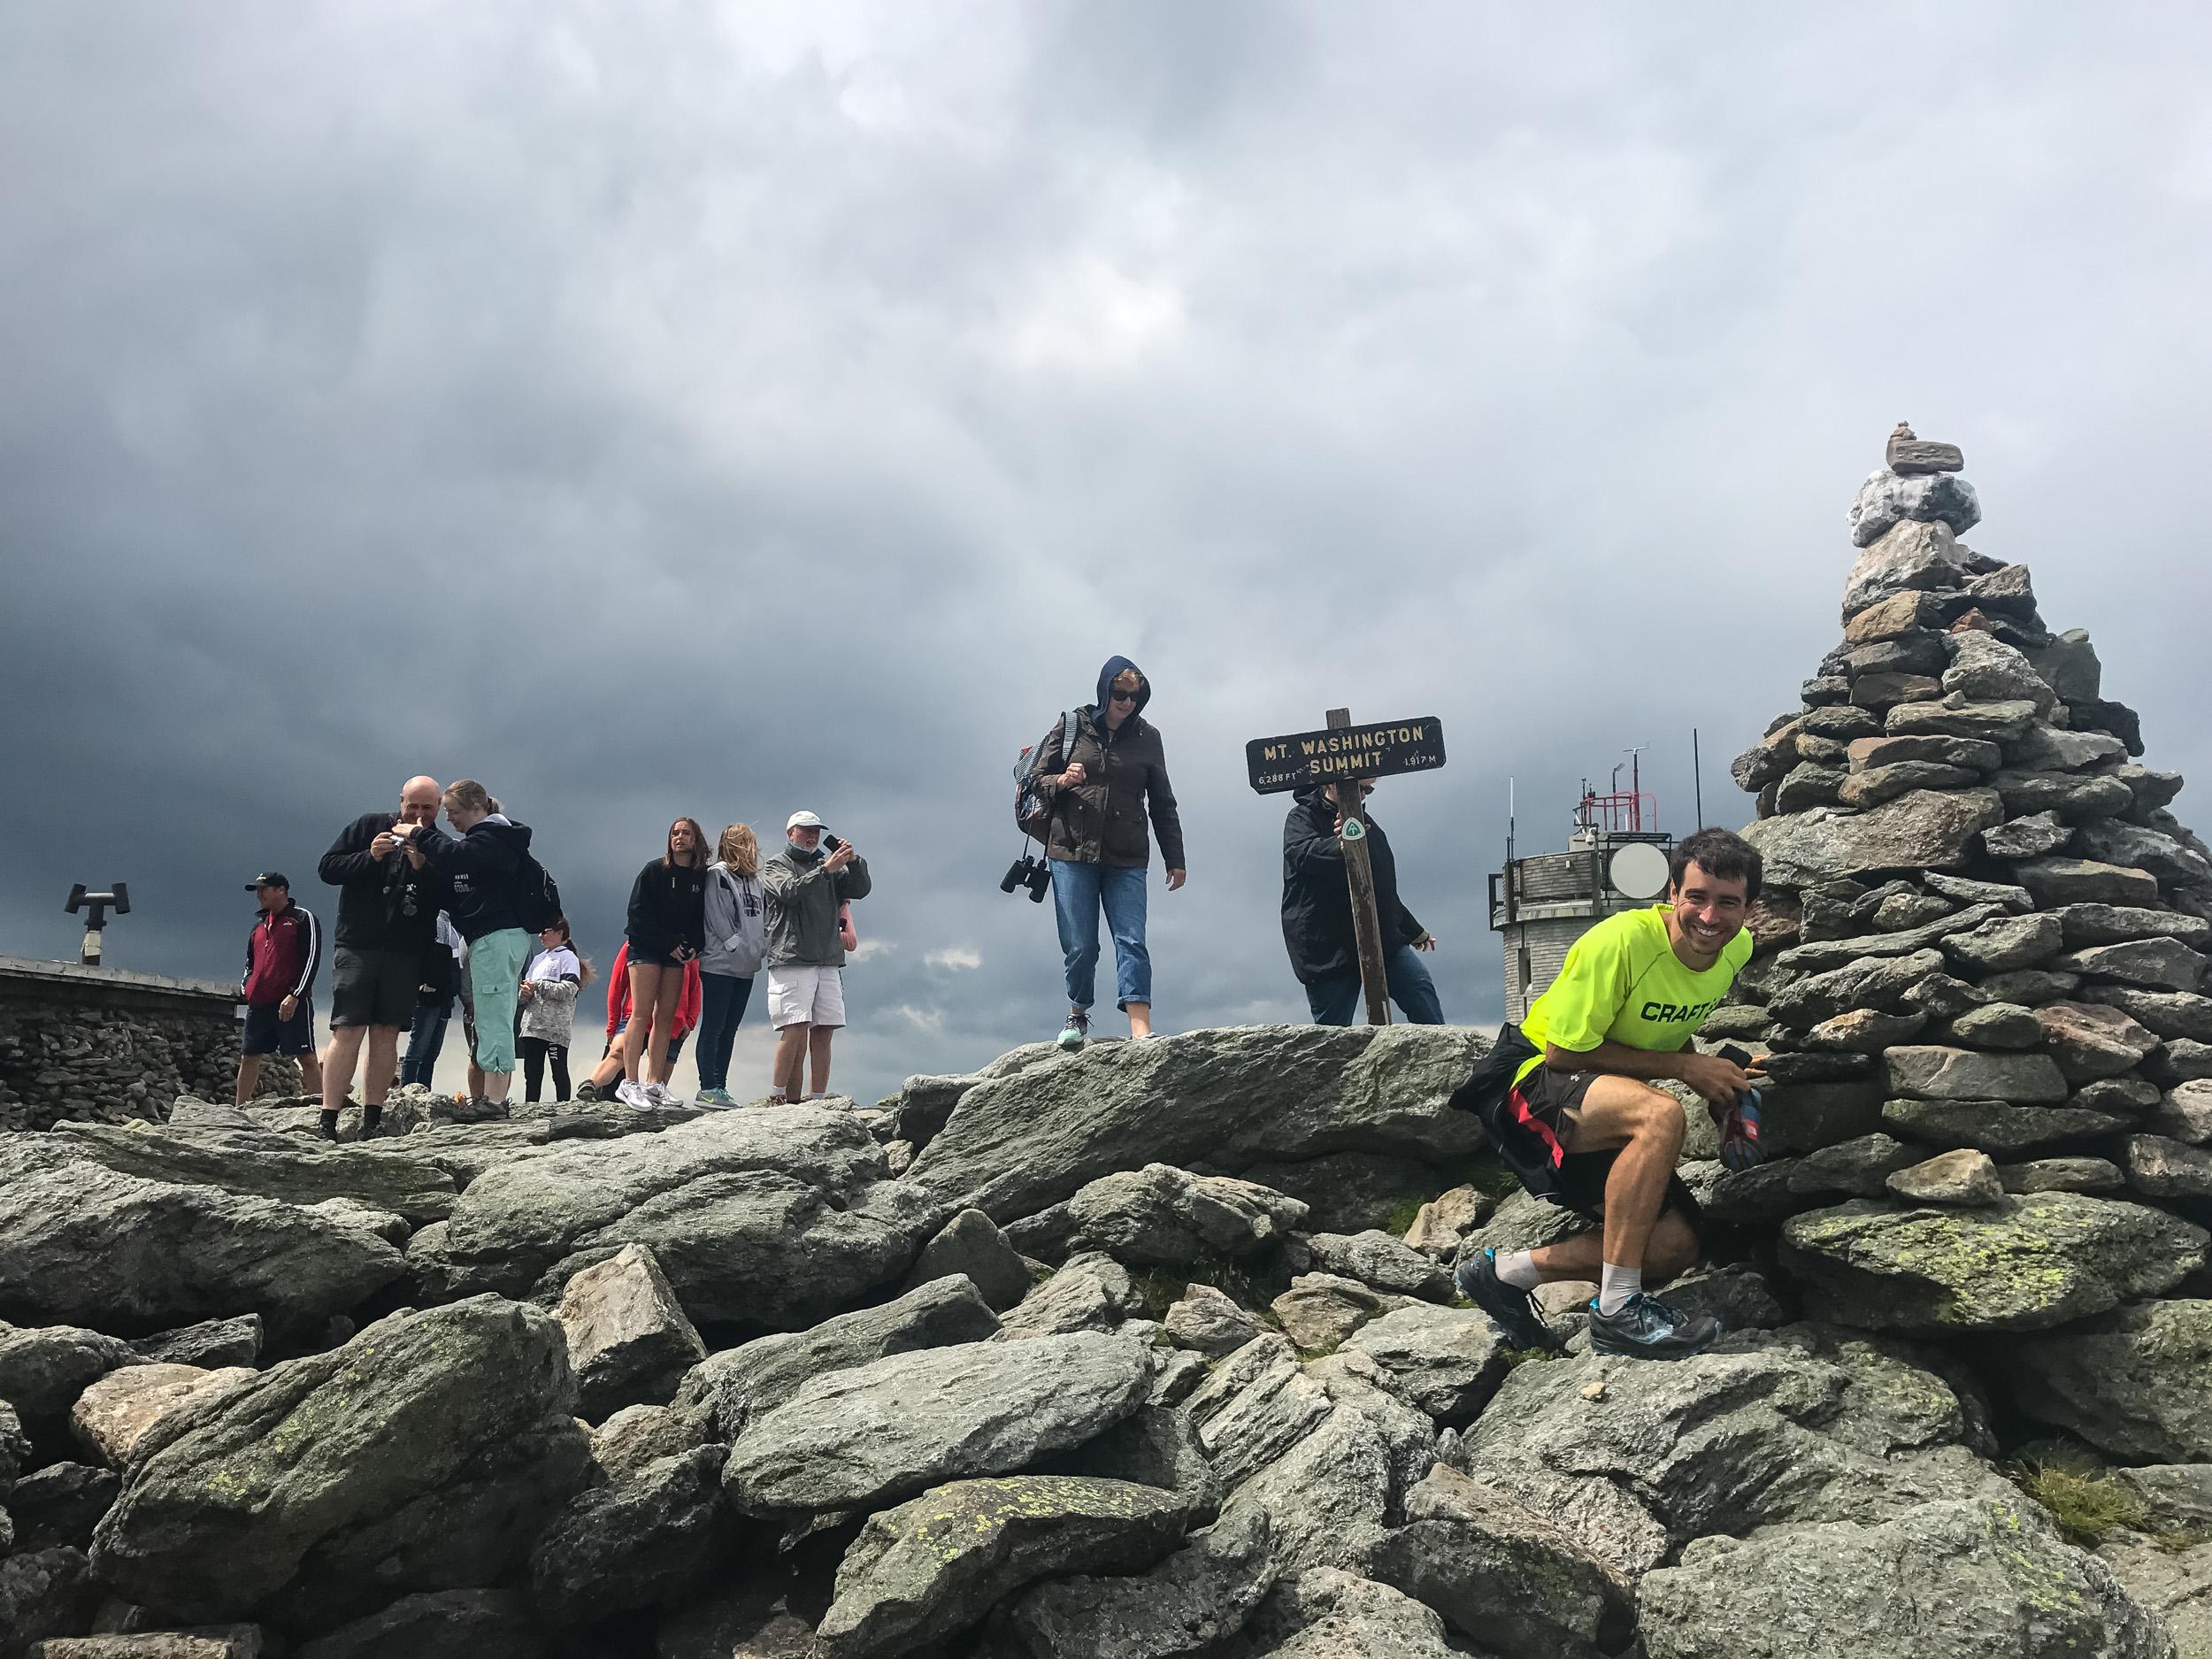 Mount Washington Summit Cairn Noah Hoffman.jpg